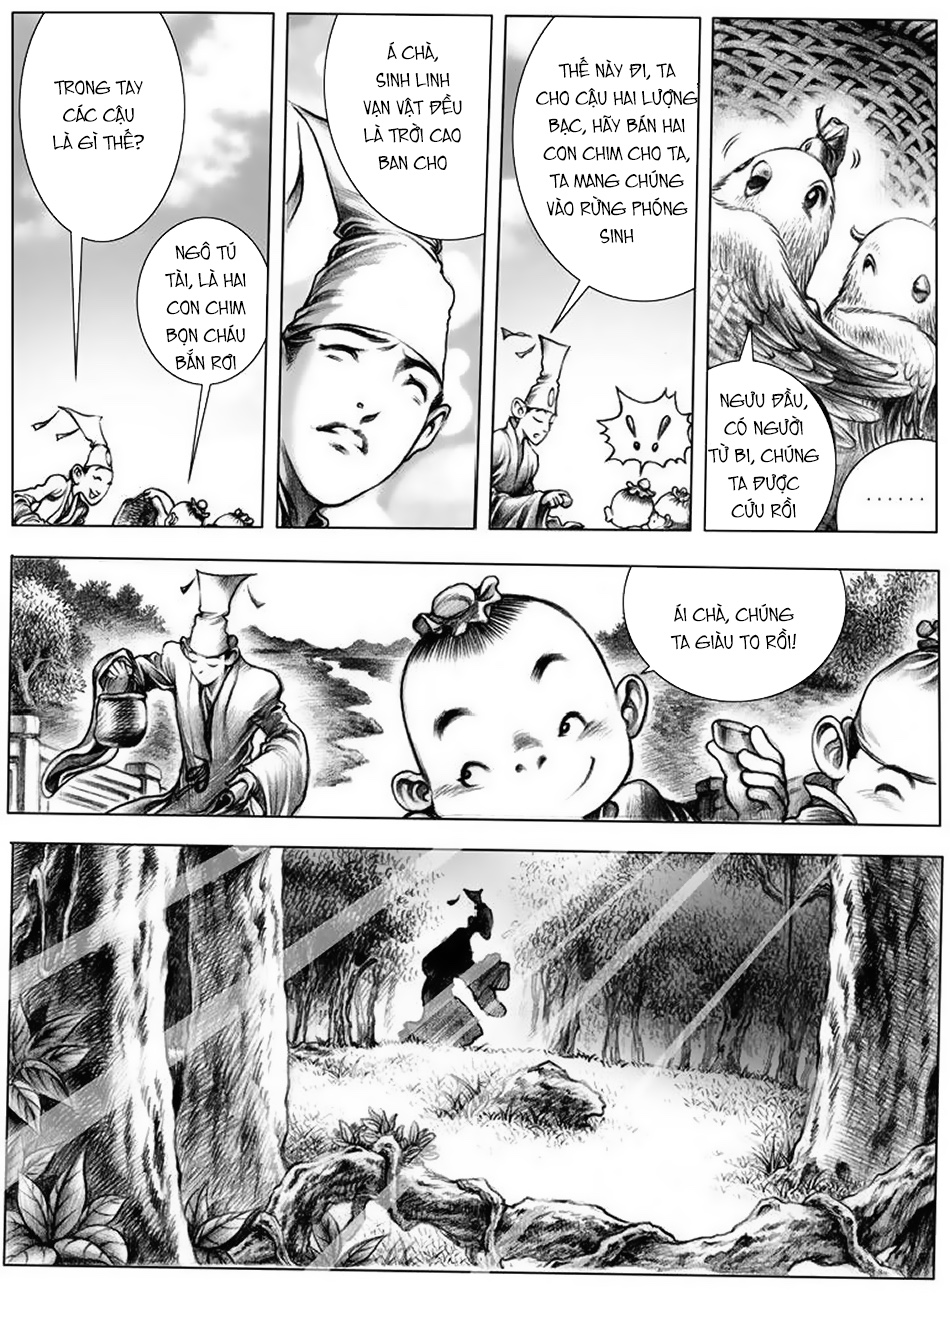 Chung Quỳ Truyền Kỳ Chapter 8 - Hamtruyen.vn